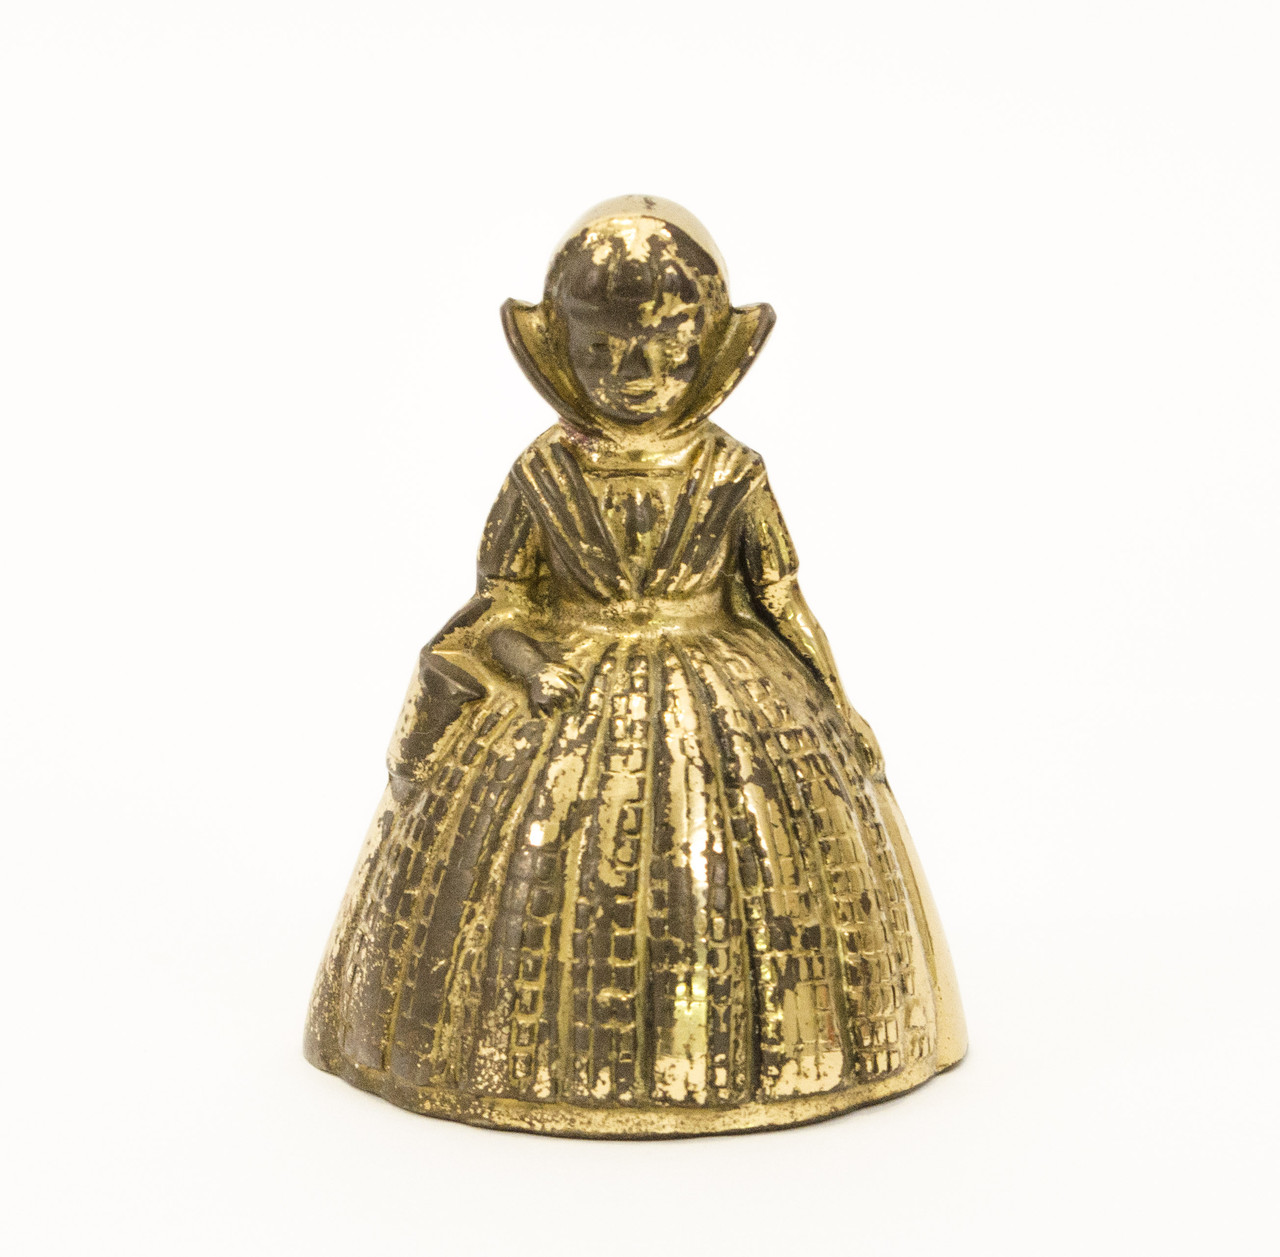 Старый бронзовый колокольчик, девочка, бронза, Англия